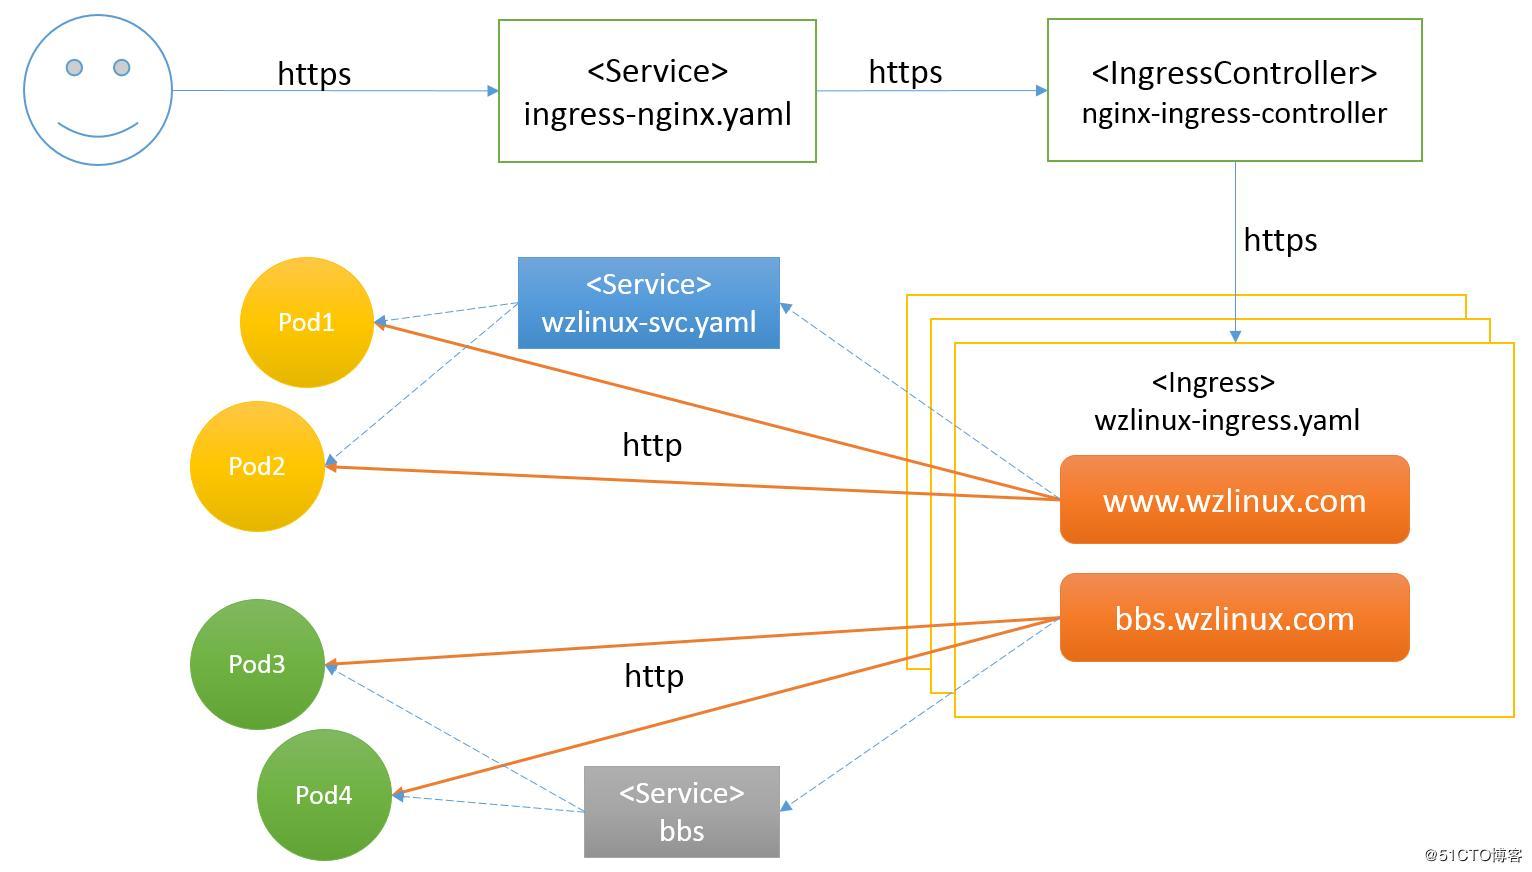 Kubernetes uses ingress to configure https clusters (fifteen